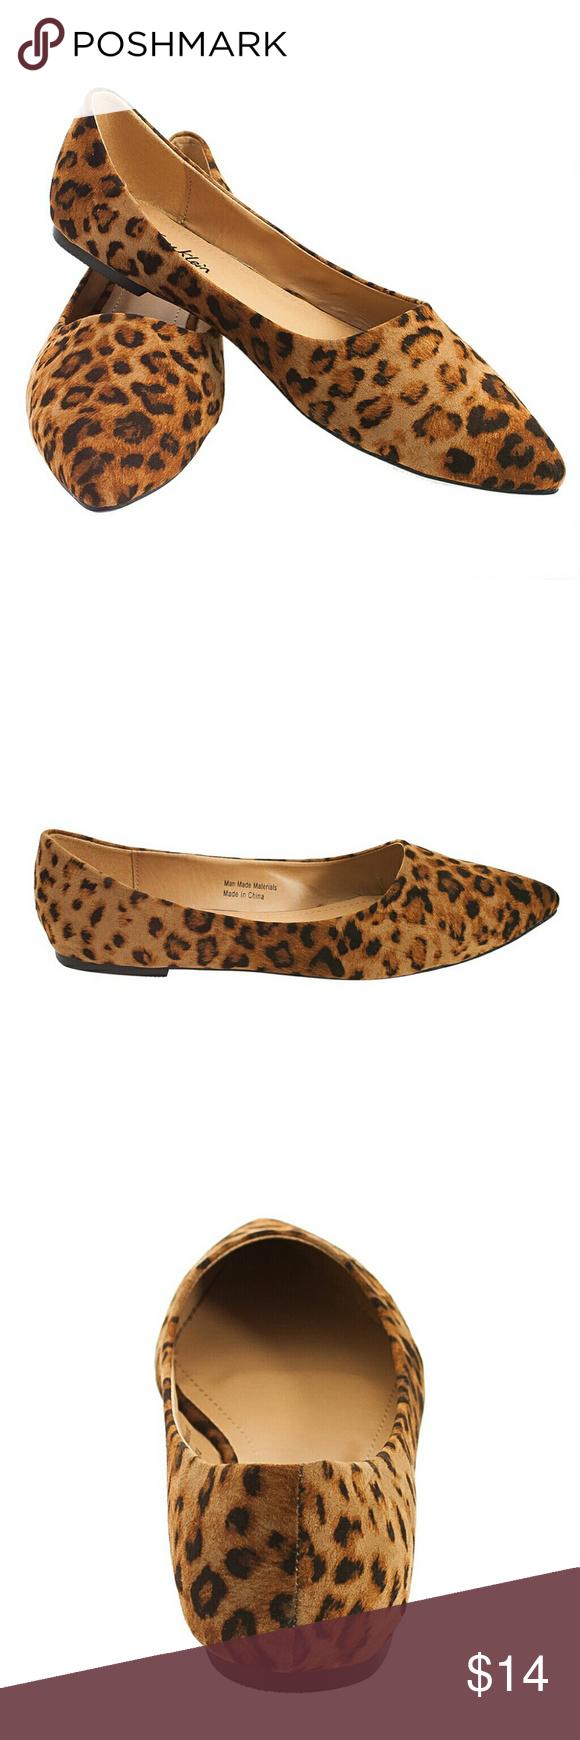 6d6c0066f Tory K Leopard Flats, b-1350, Dark Brown Brand new Tory K dark leopard  pointy toe woman ballerina flats. Comfortable padded sole.